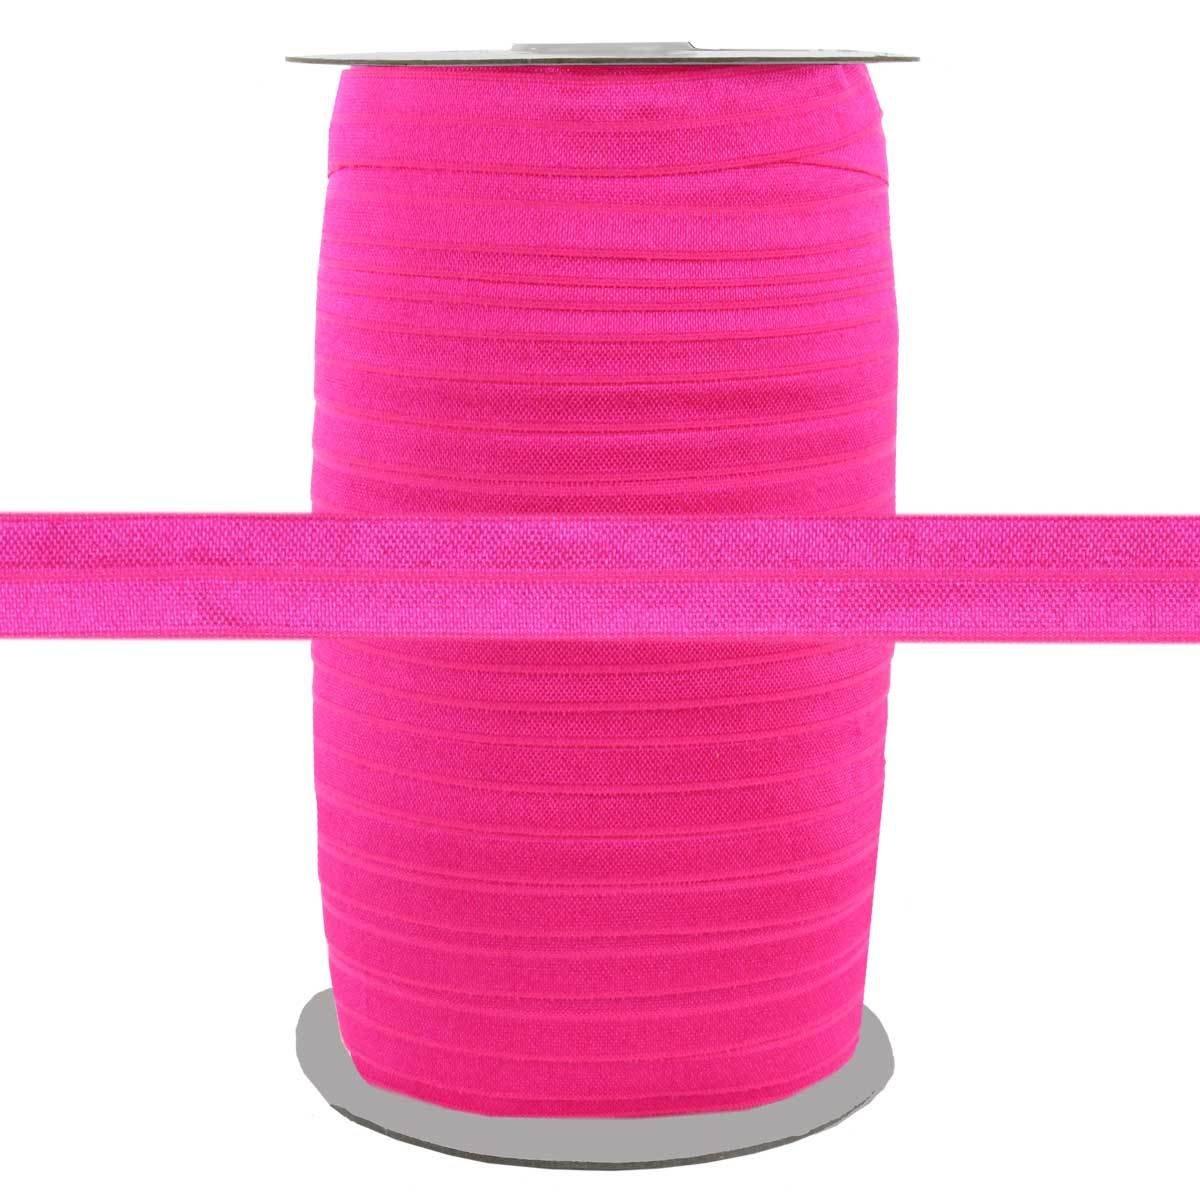 100 Yards - Hot Pink - 5/8'' Fold Over Elastic - ElasticByTheYard by ElasticByTheYard